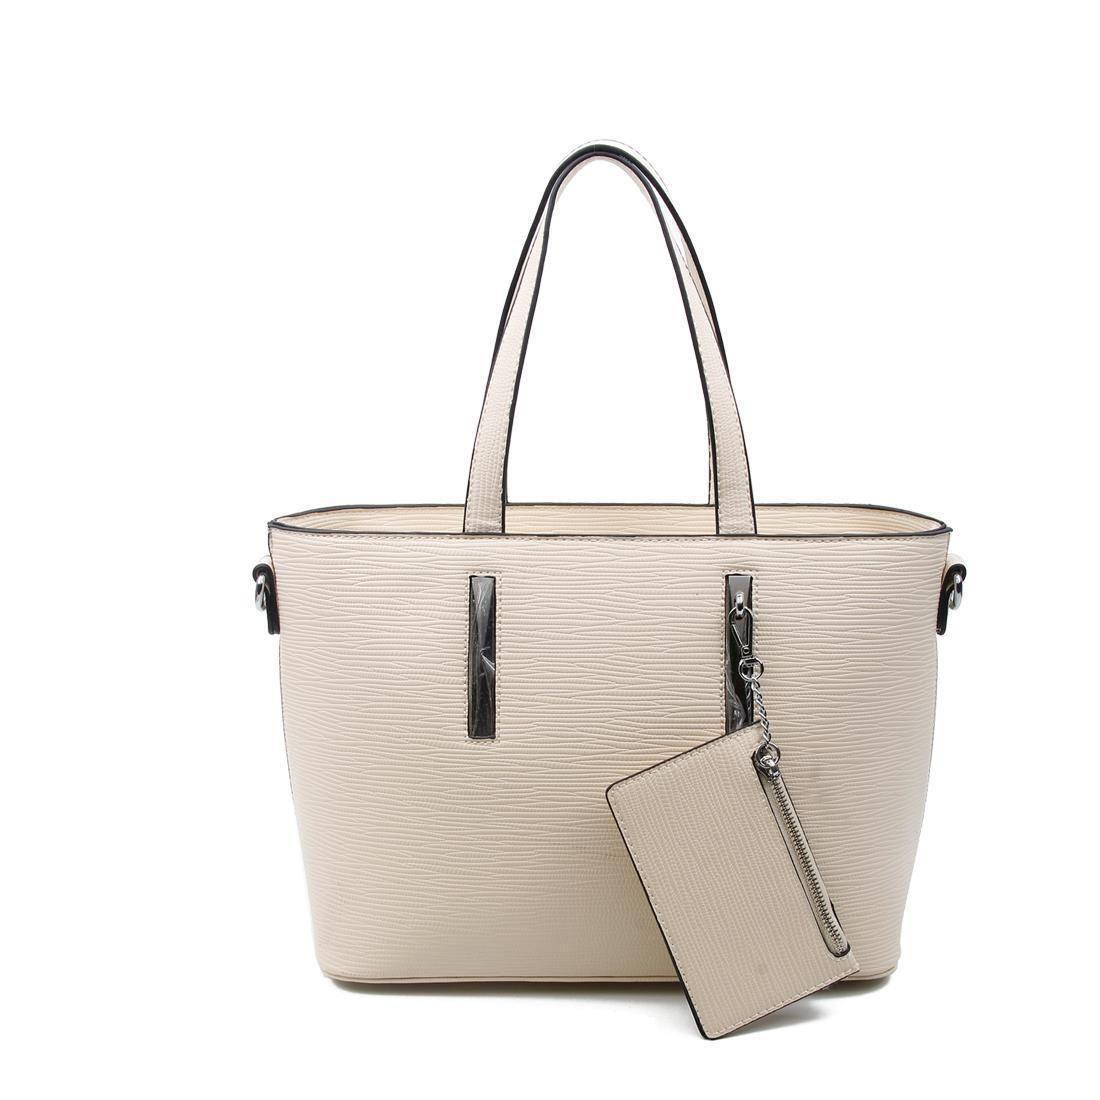 Damen Bussines Tasche Shopper Workbag Schultertasche Handtasche Arbeitstasche Eur 39 95 Angebotsende Montag Bolsas De Couro Bolsa De Trabalho Bolsa De Ombro